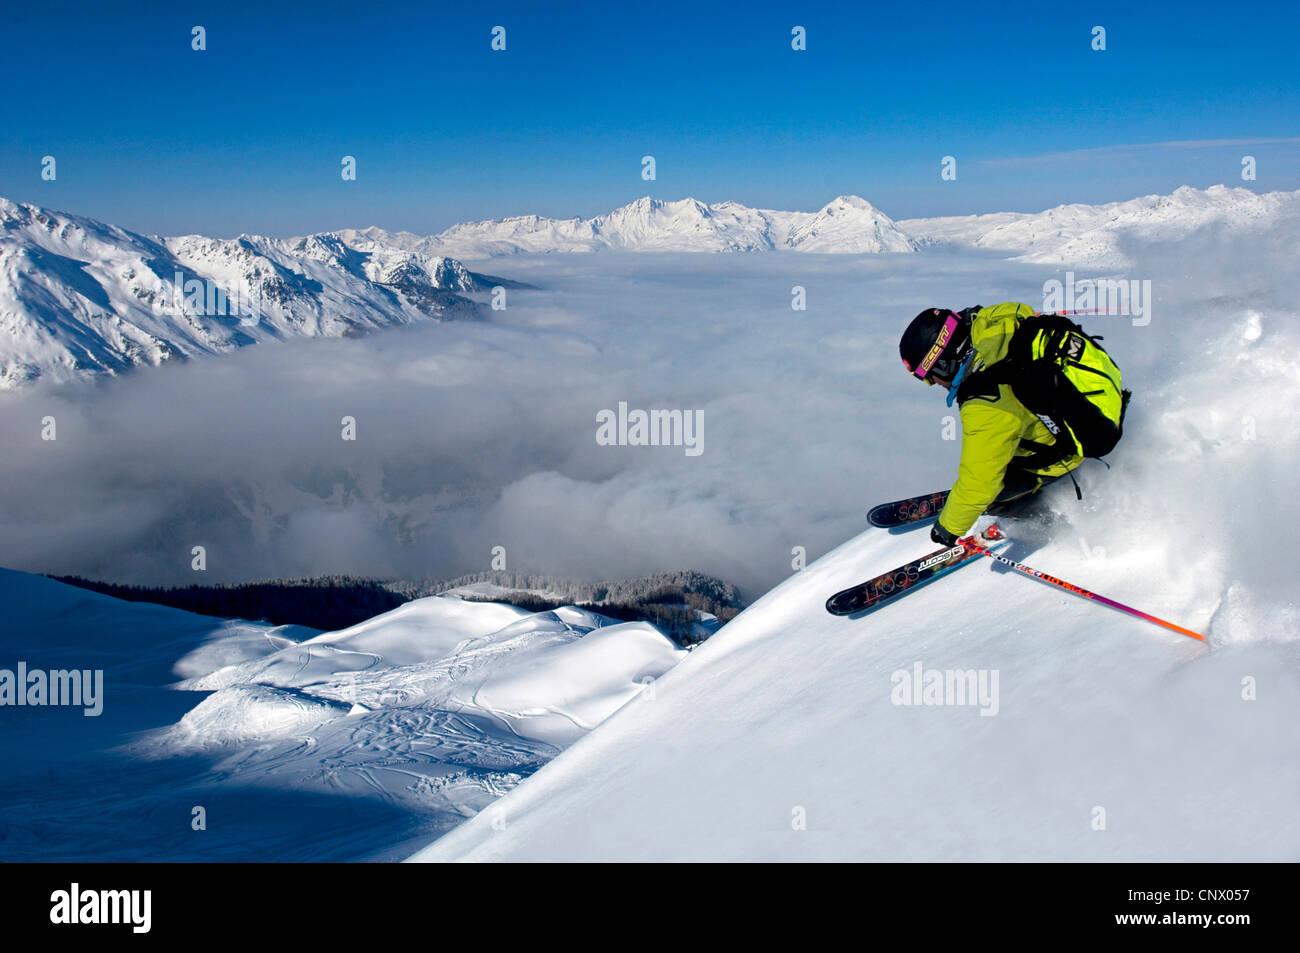 skier in Sainte Foy Tarentaise ski resort, north Alps mountains, France - Stock Image